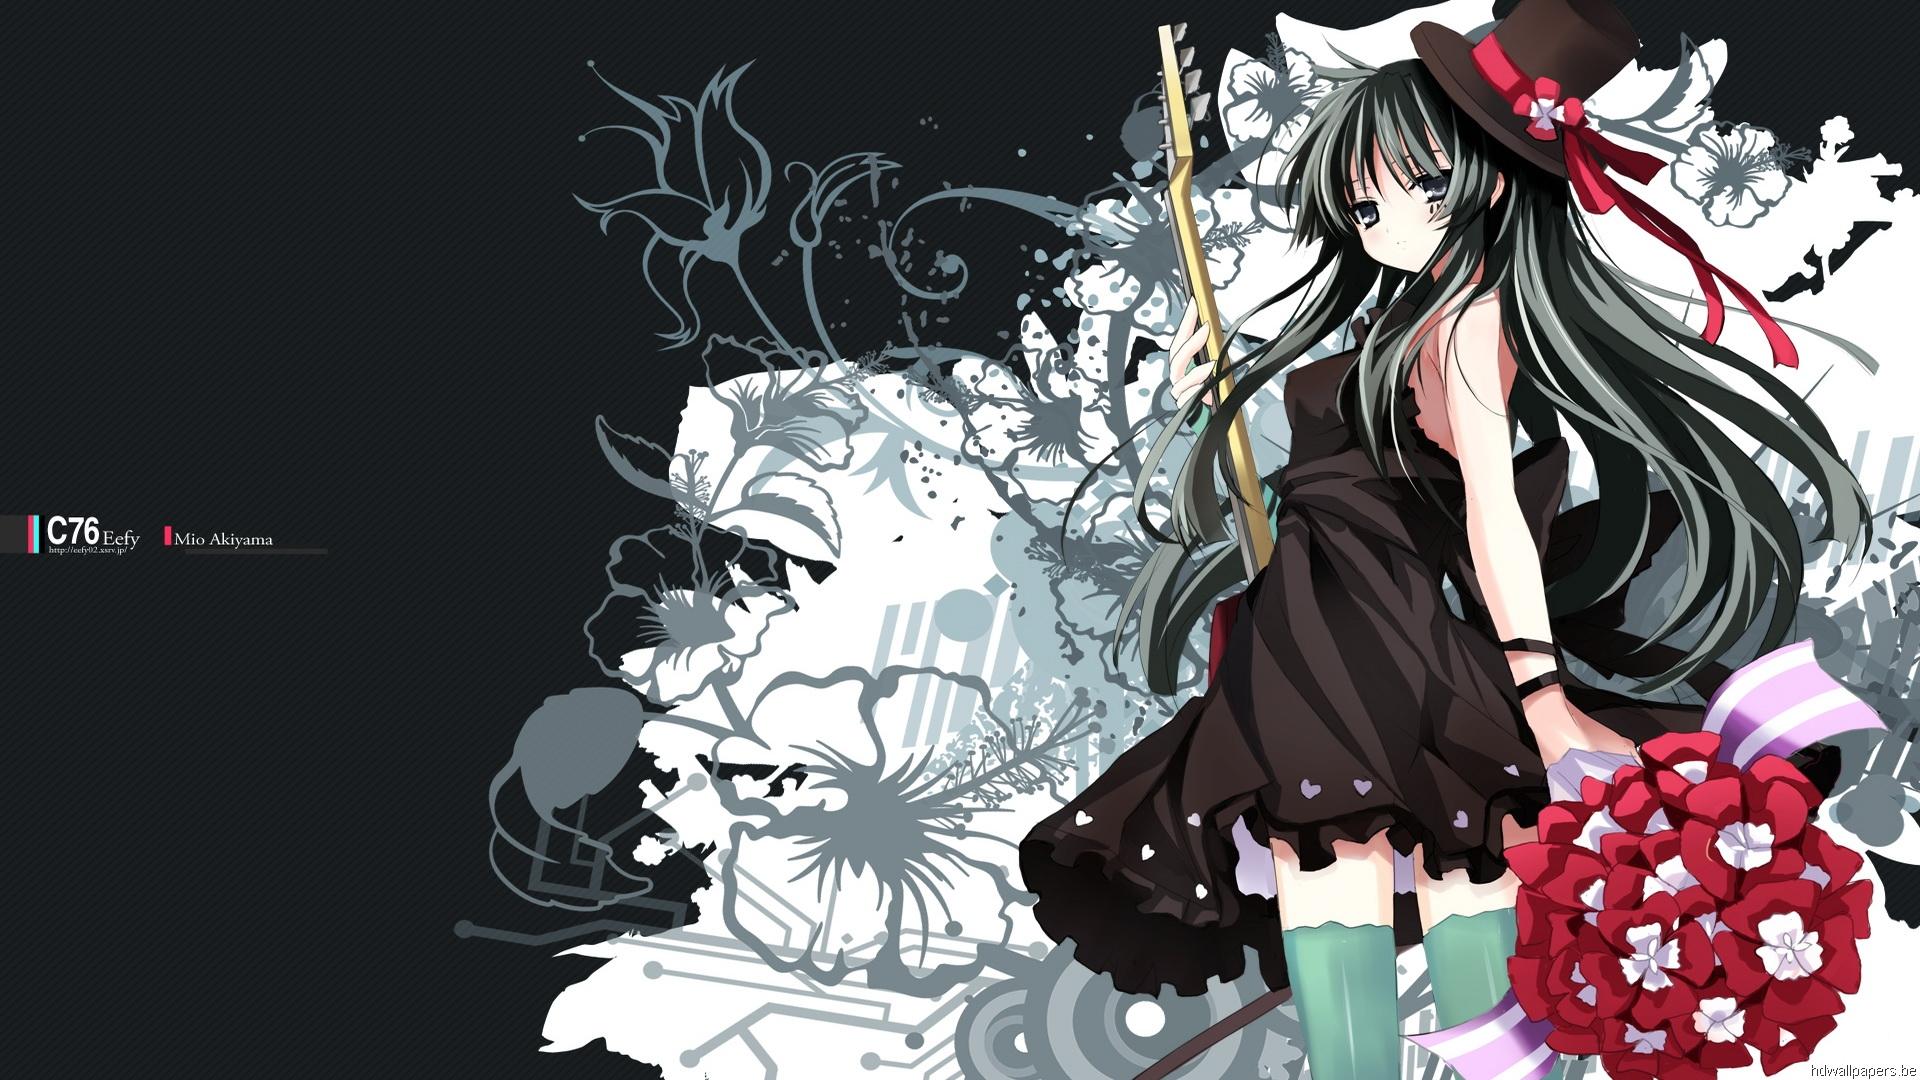 Awesome anime wallpapers hd wallpapersafari - Full hd anime wallpaper pack ...